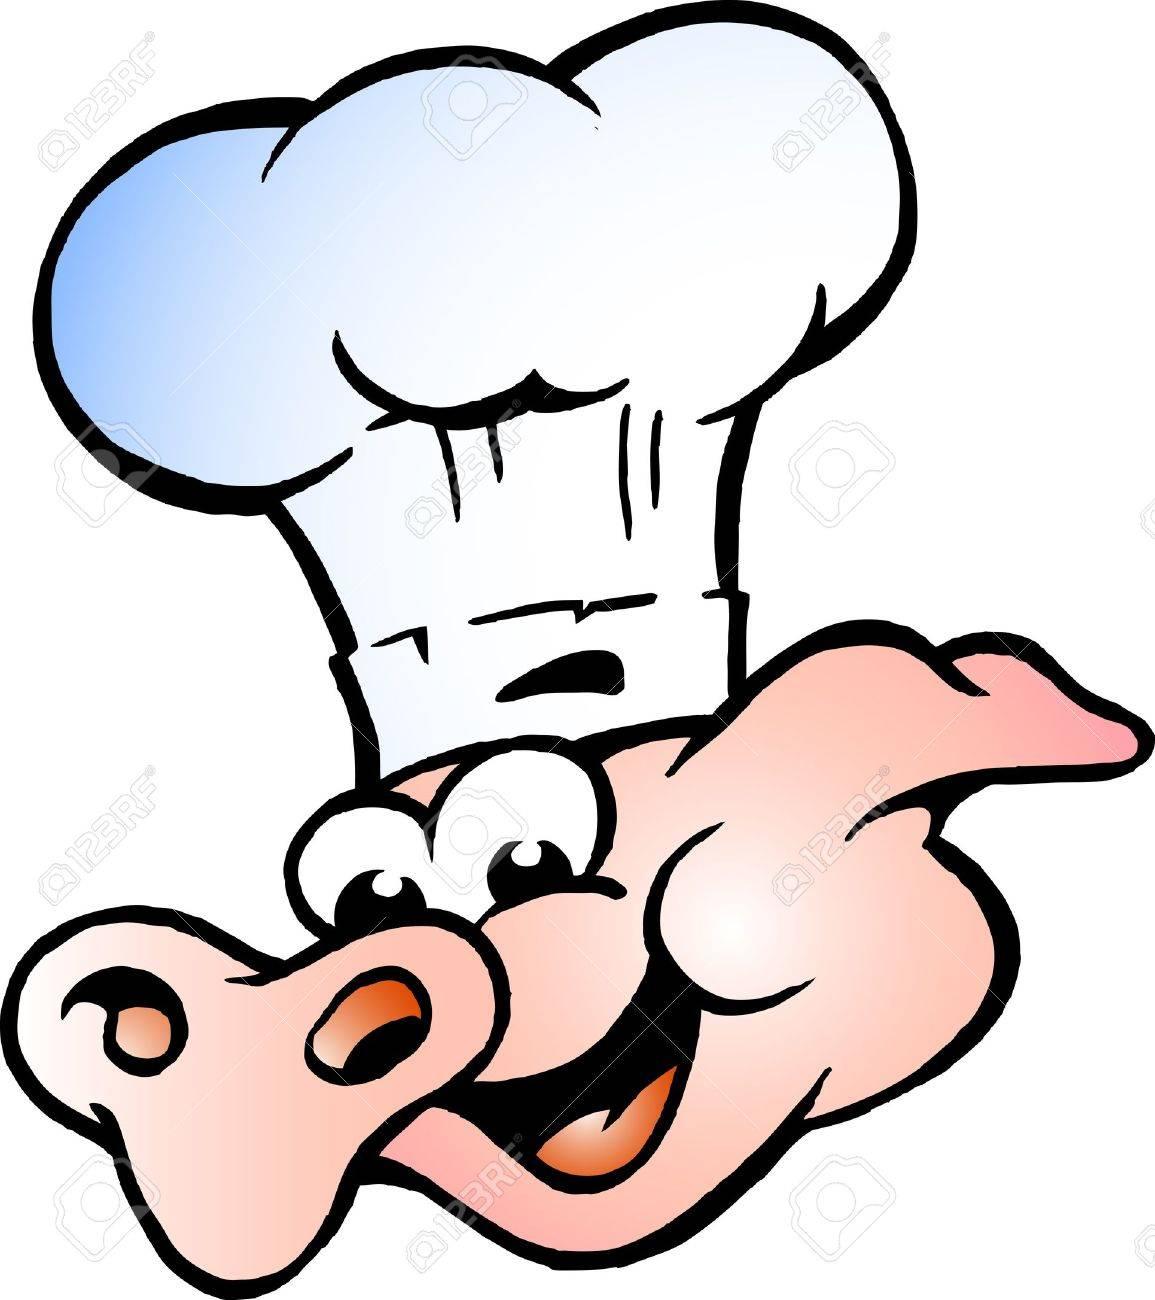 Hand-drawn Vector illustration of an Chef Pig Head Stock Illustration - 17309977